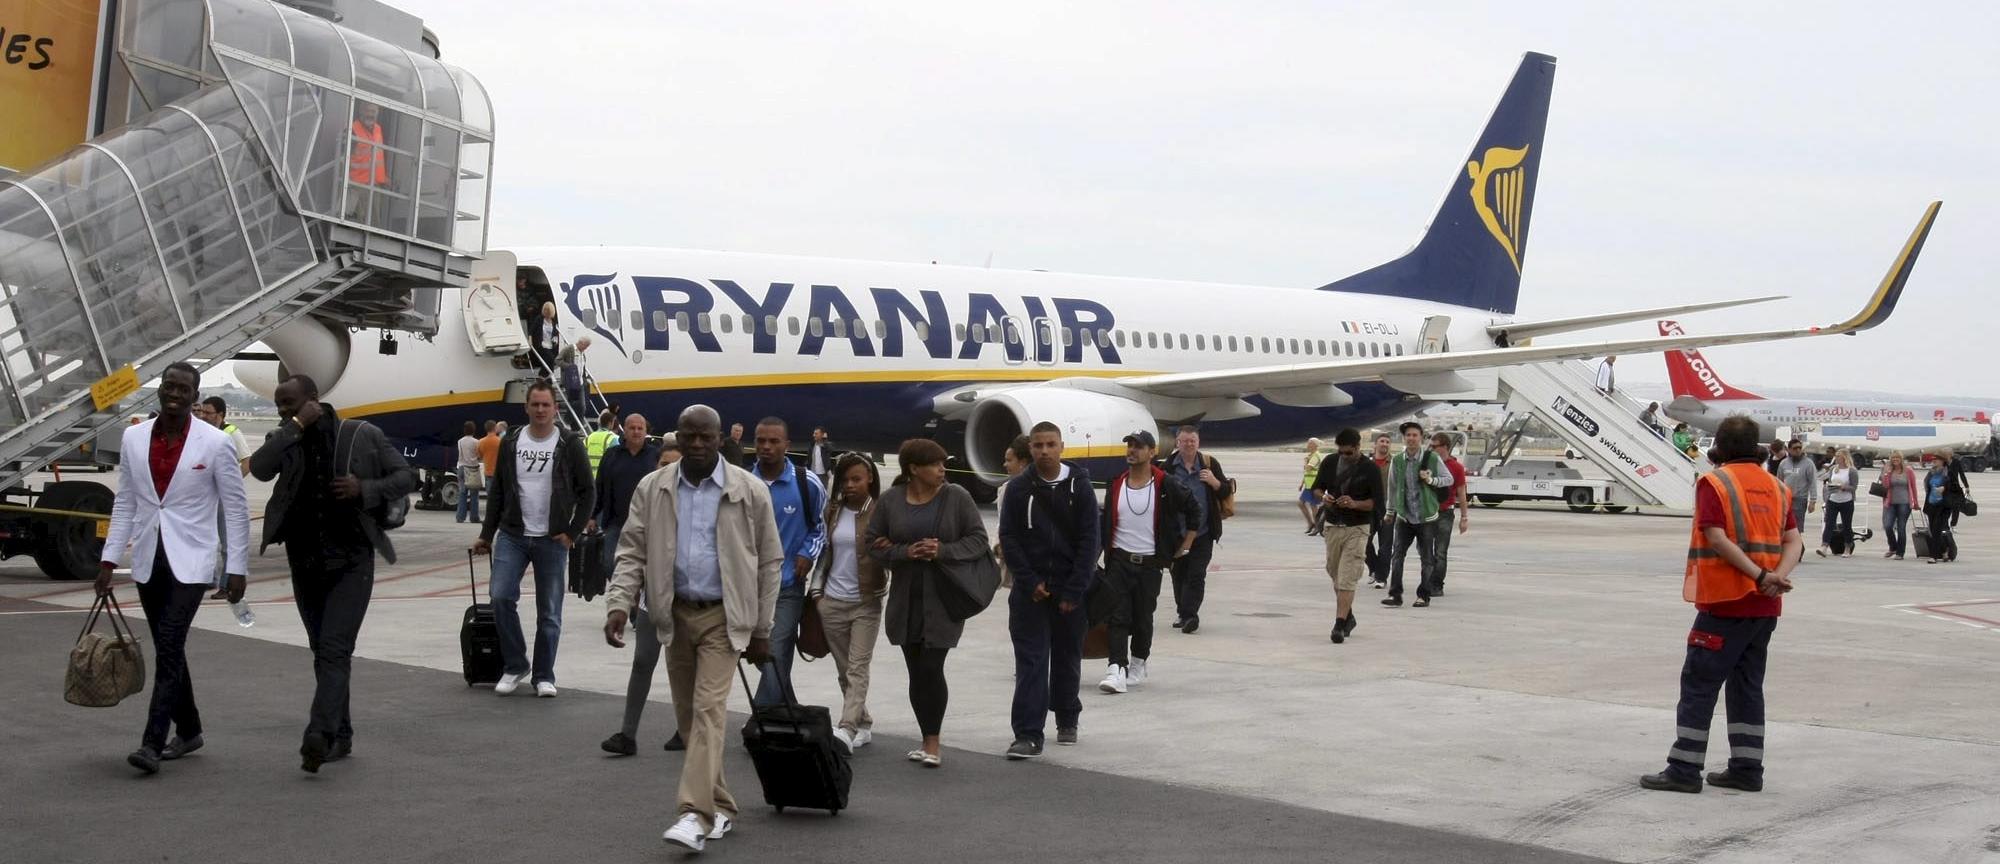 c5eb5e500 Italia prohíbe a Ryanair cobrar por el equipaje de mano - Republica.com